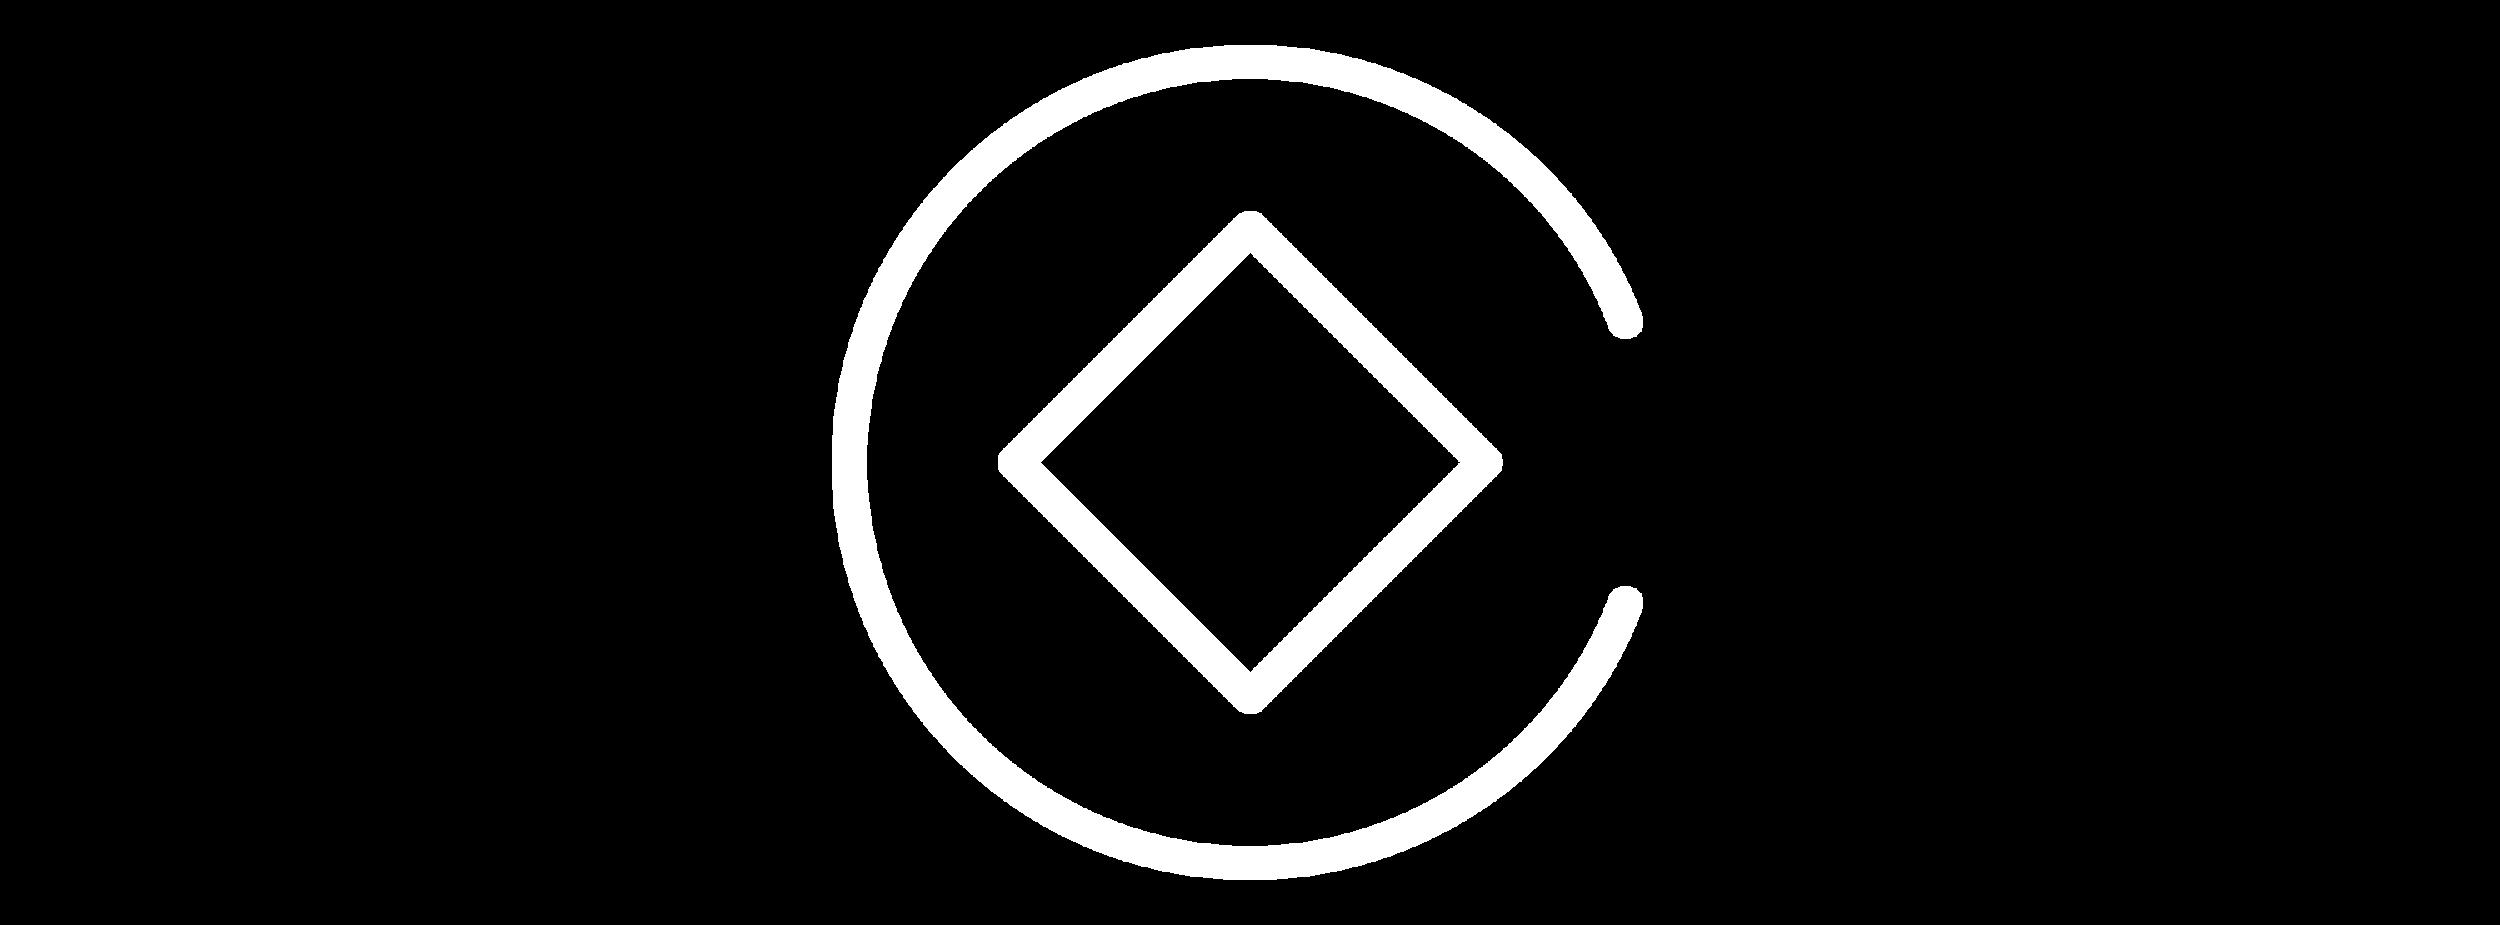 circle-logo-symbol-white copy.png